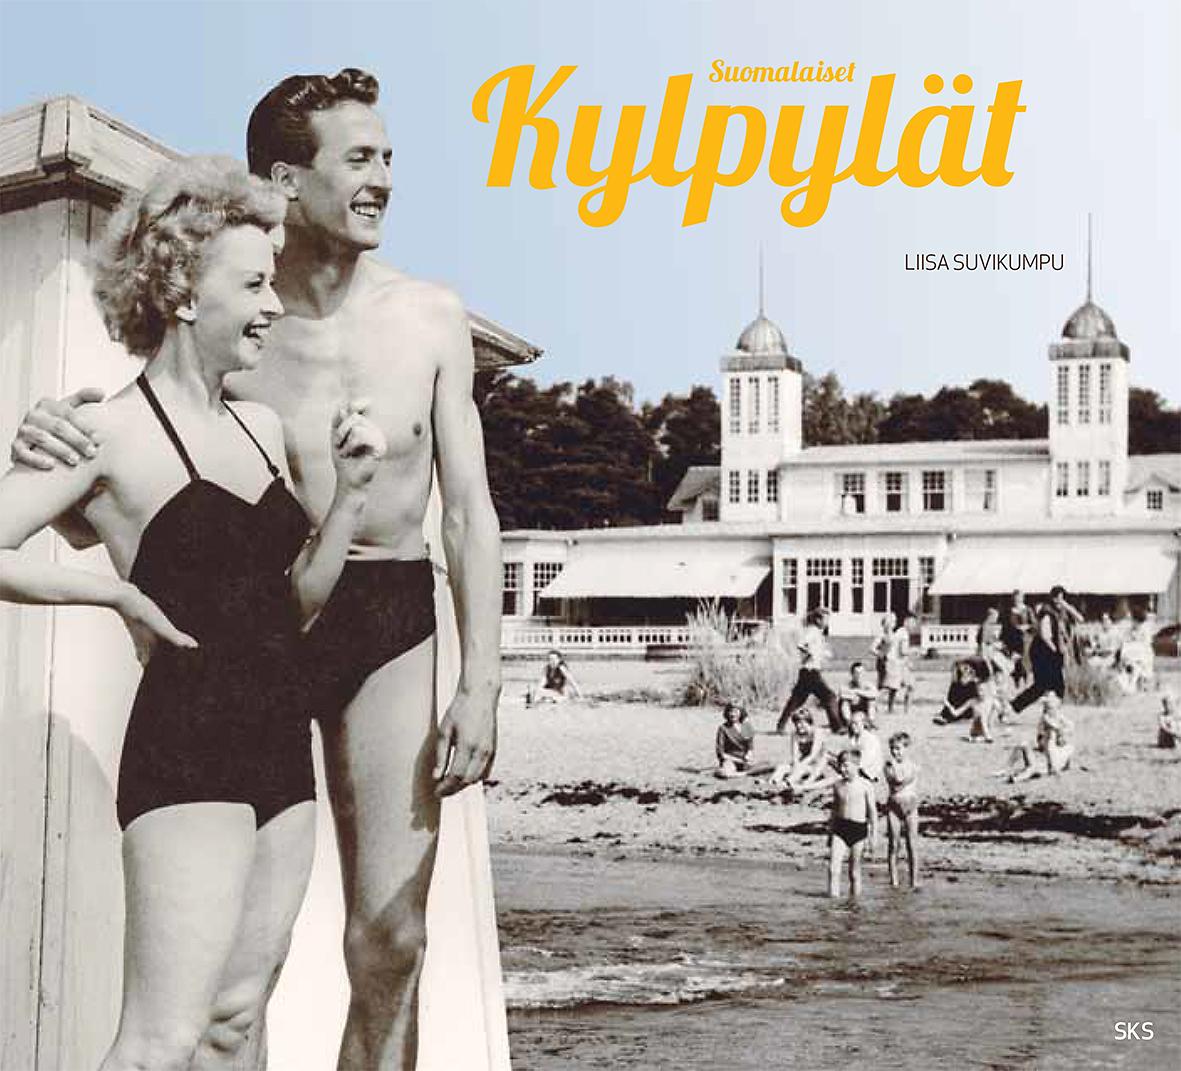 Liisa-Suvikumpu_Suomalaiset-kylpylat.jpg